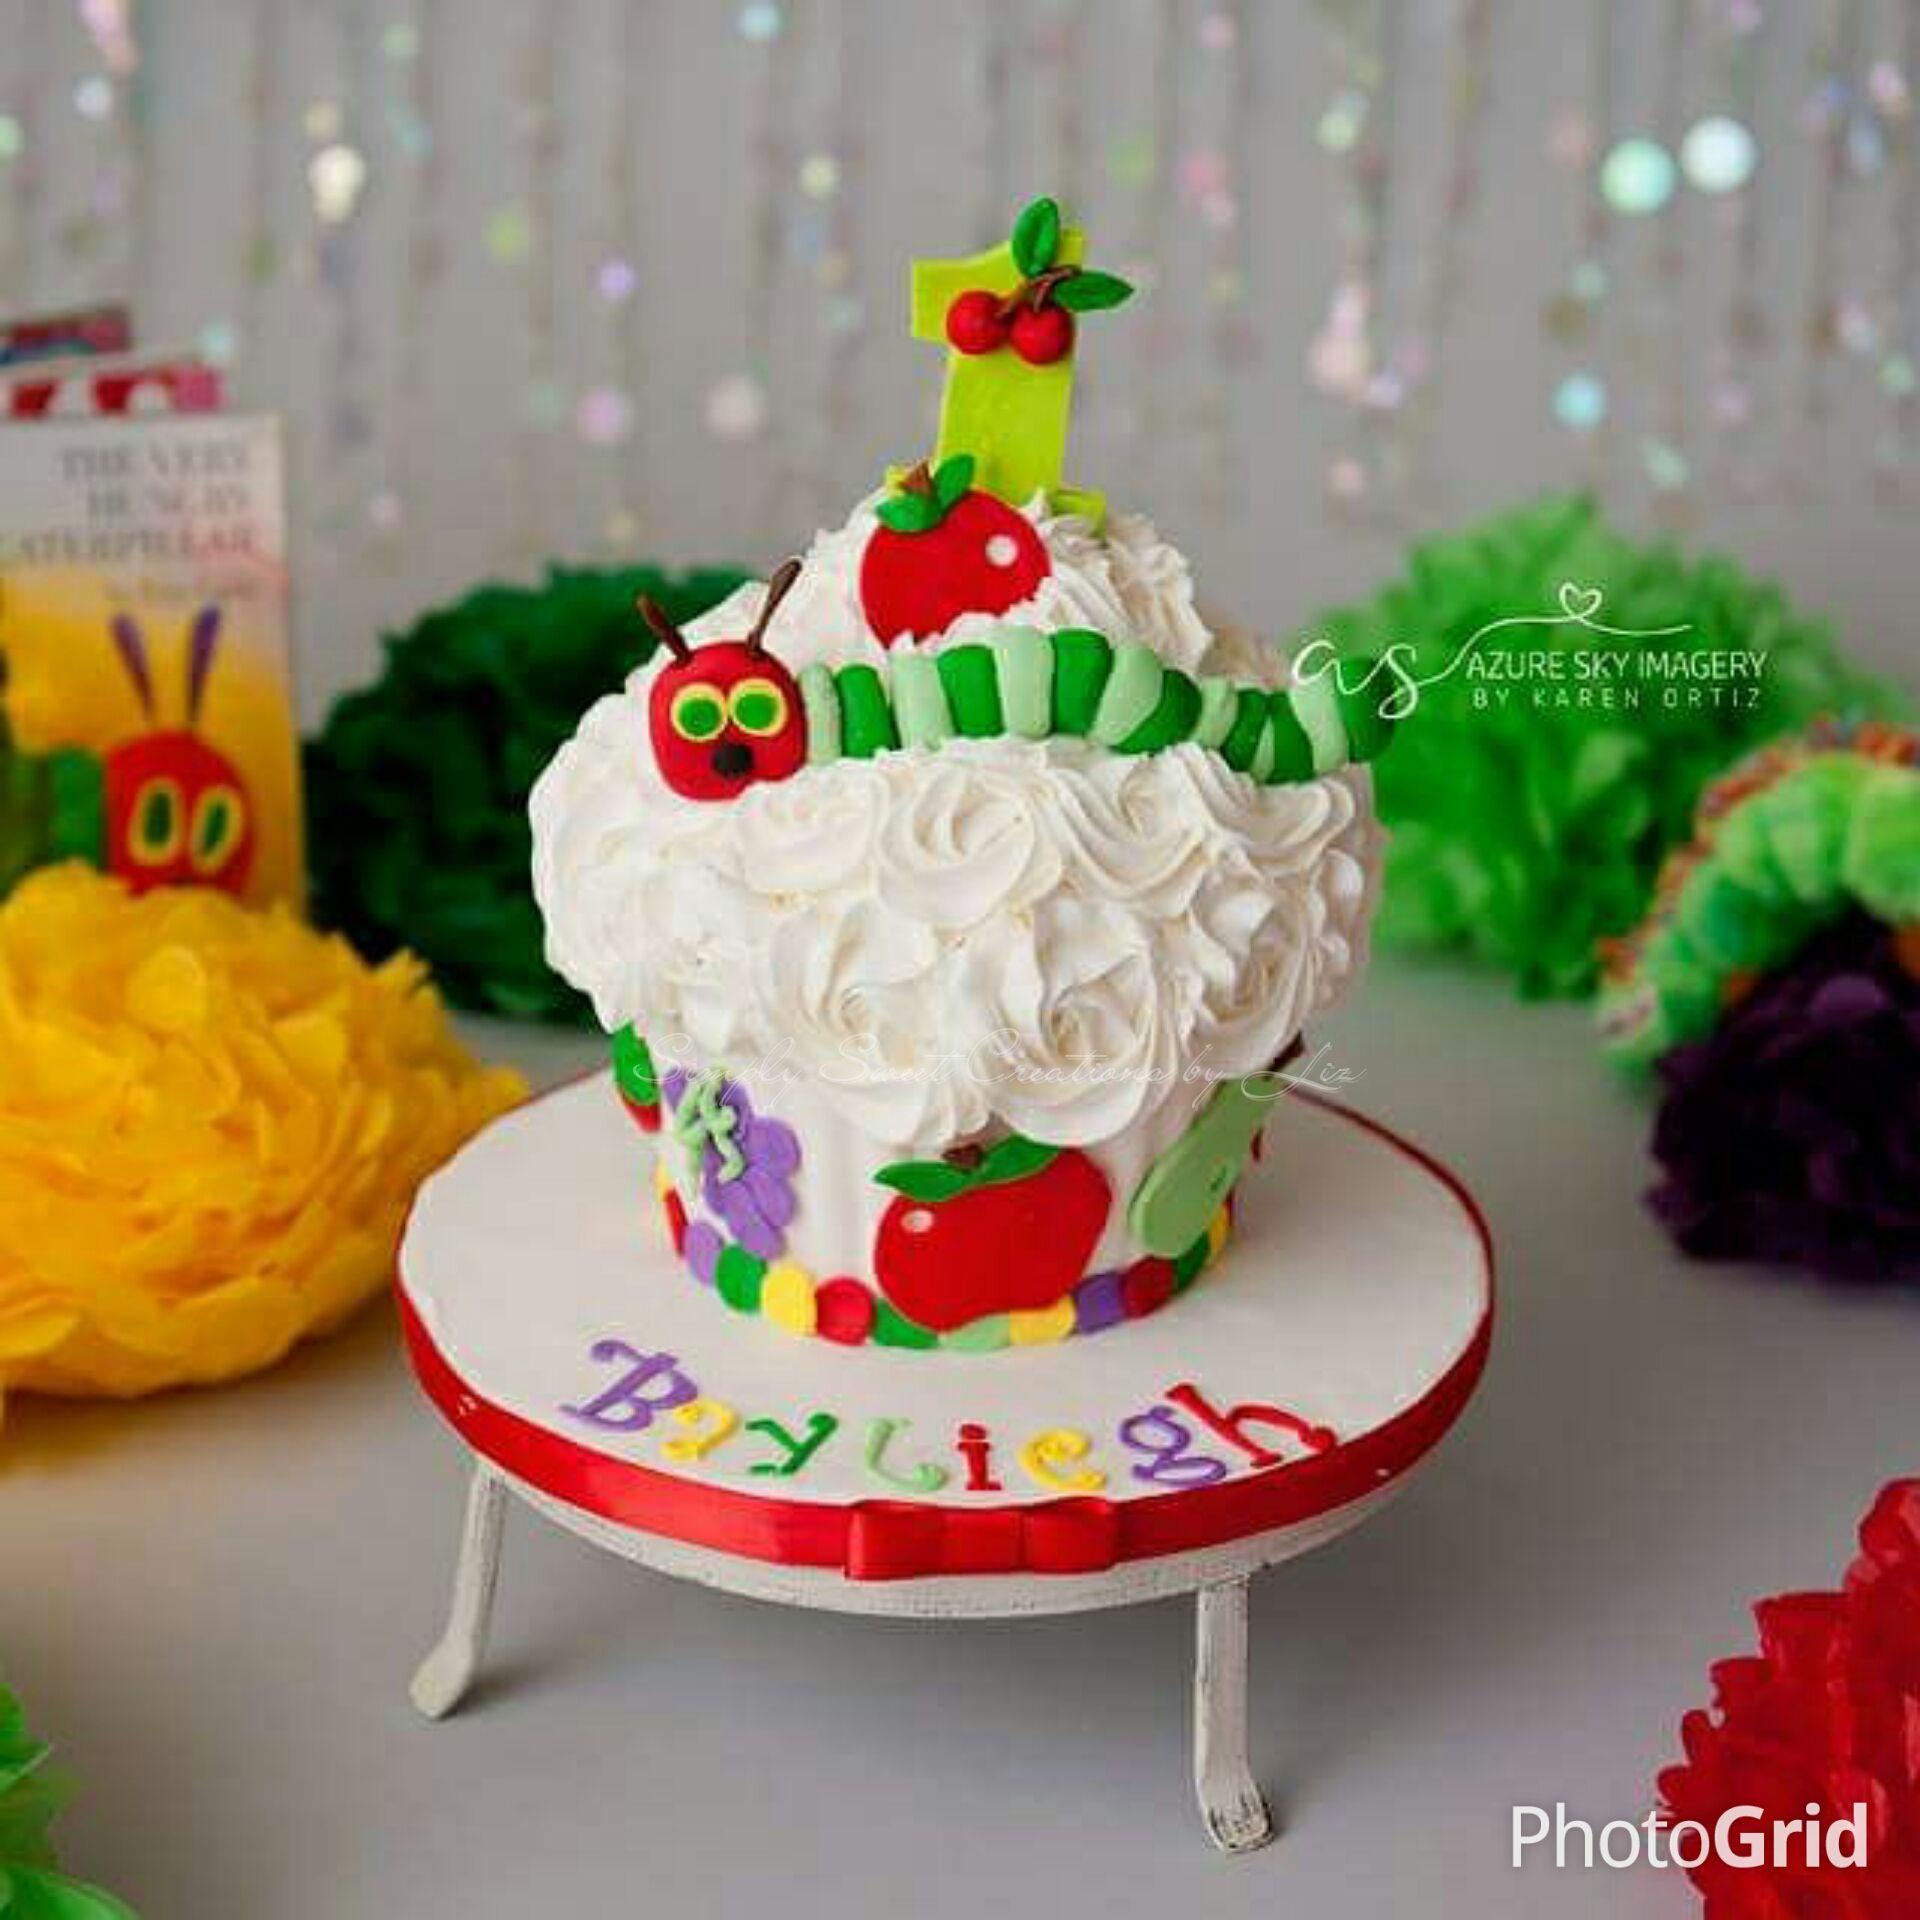 Enjoyable The Very Hungry Caterpillar Cake Smash Hungry Caterpillar Personalised Birthday Cards Veneteletsinfo